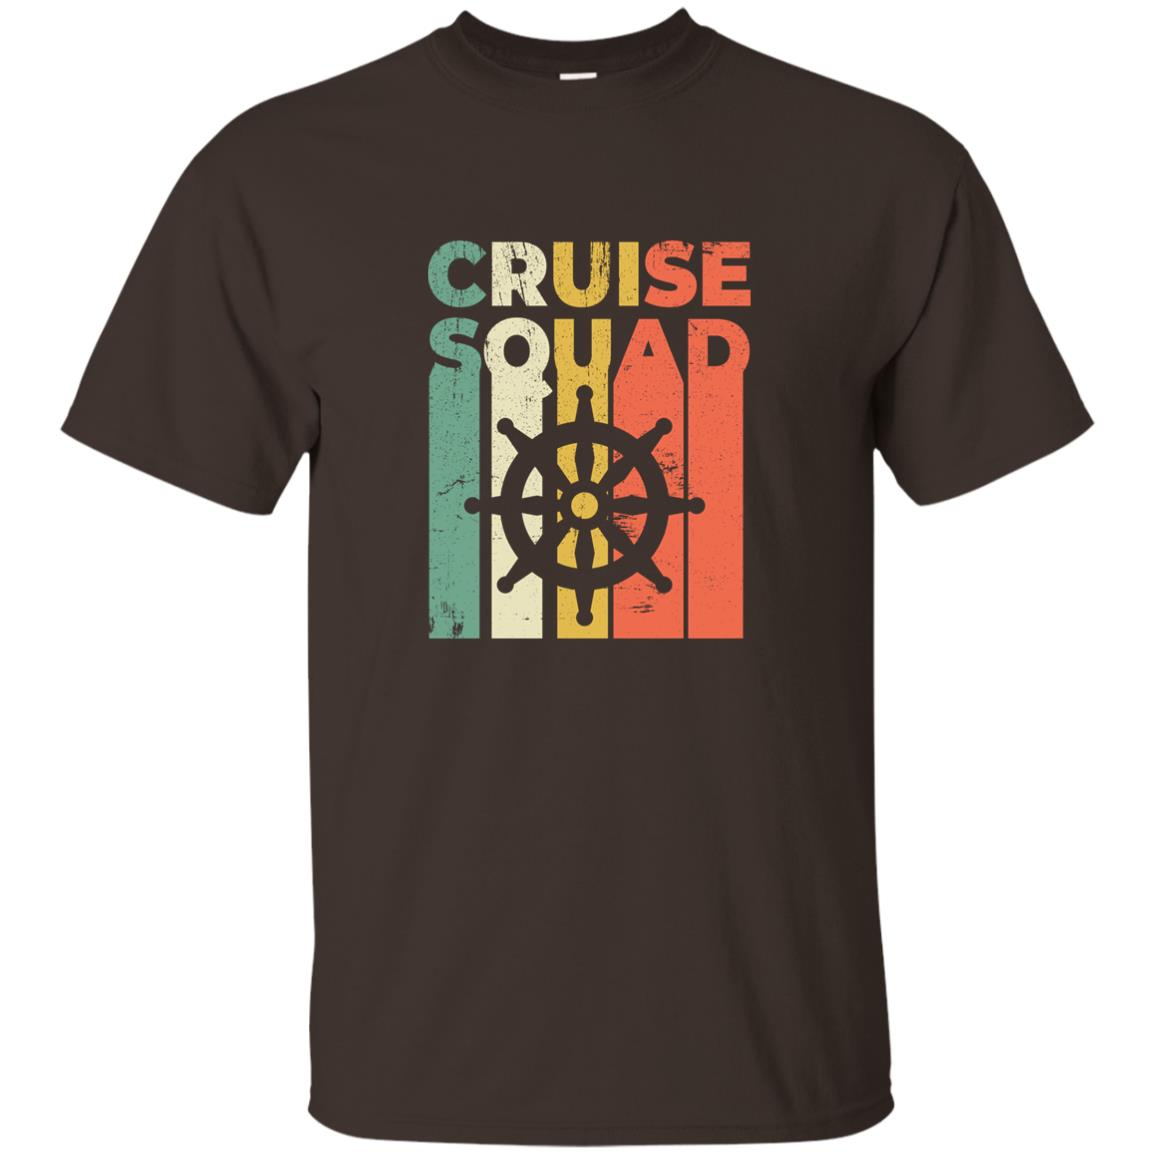 Cruise Funny Family and Group Retro Tees Unisex Short Sleeve